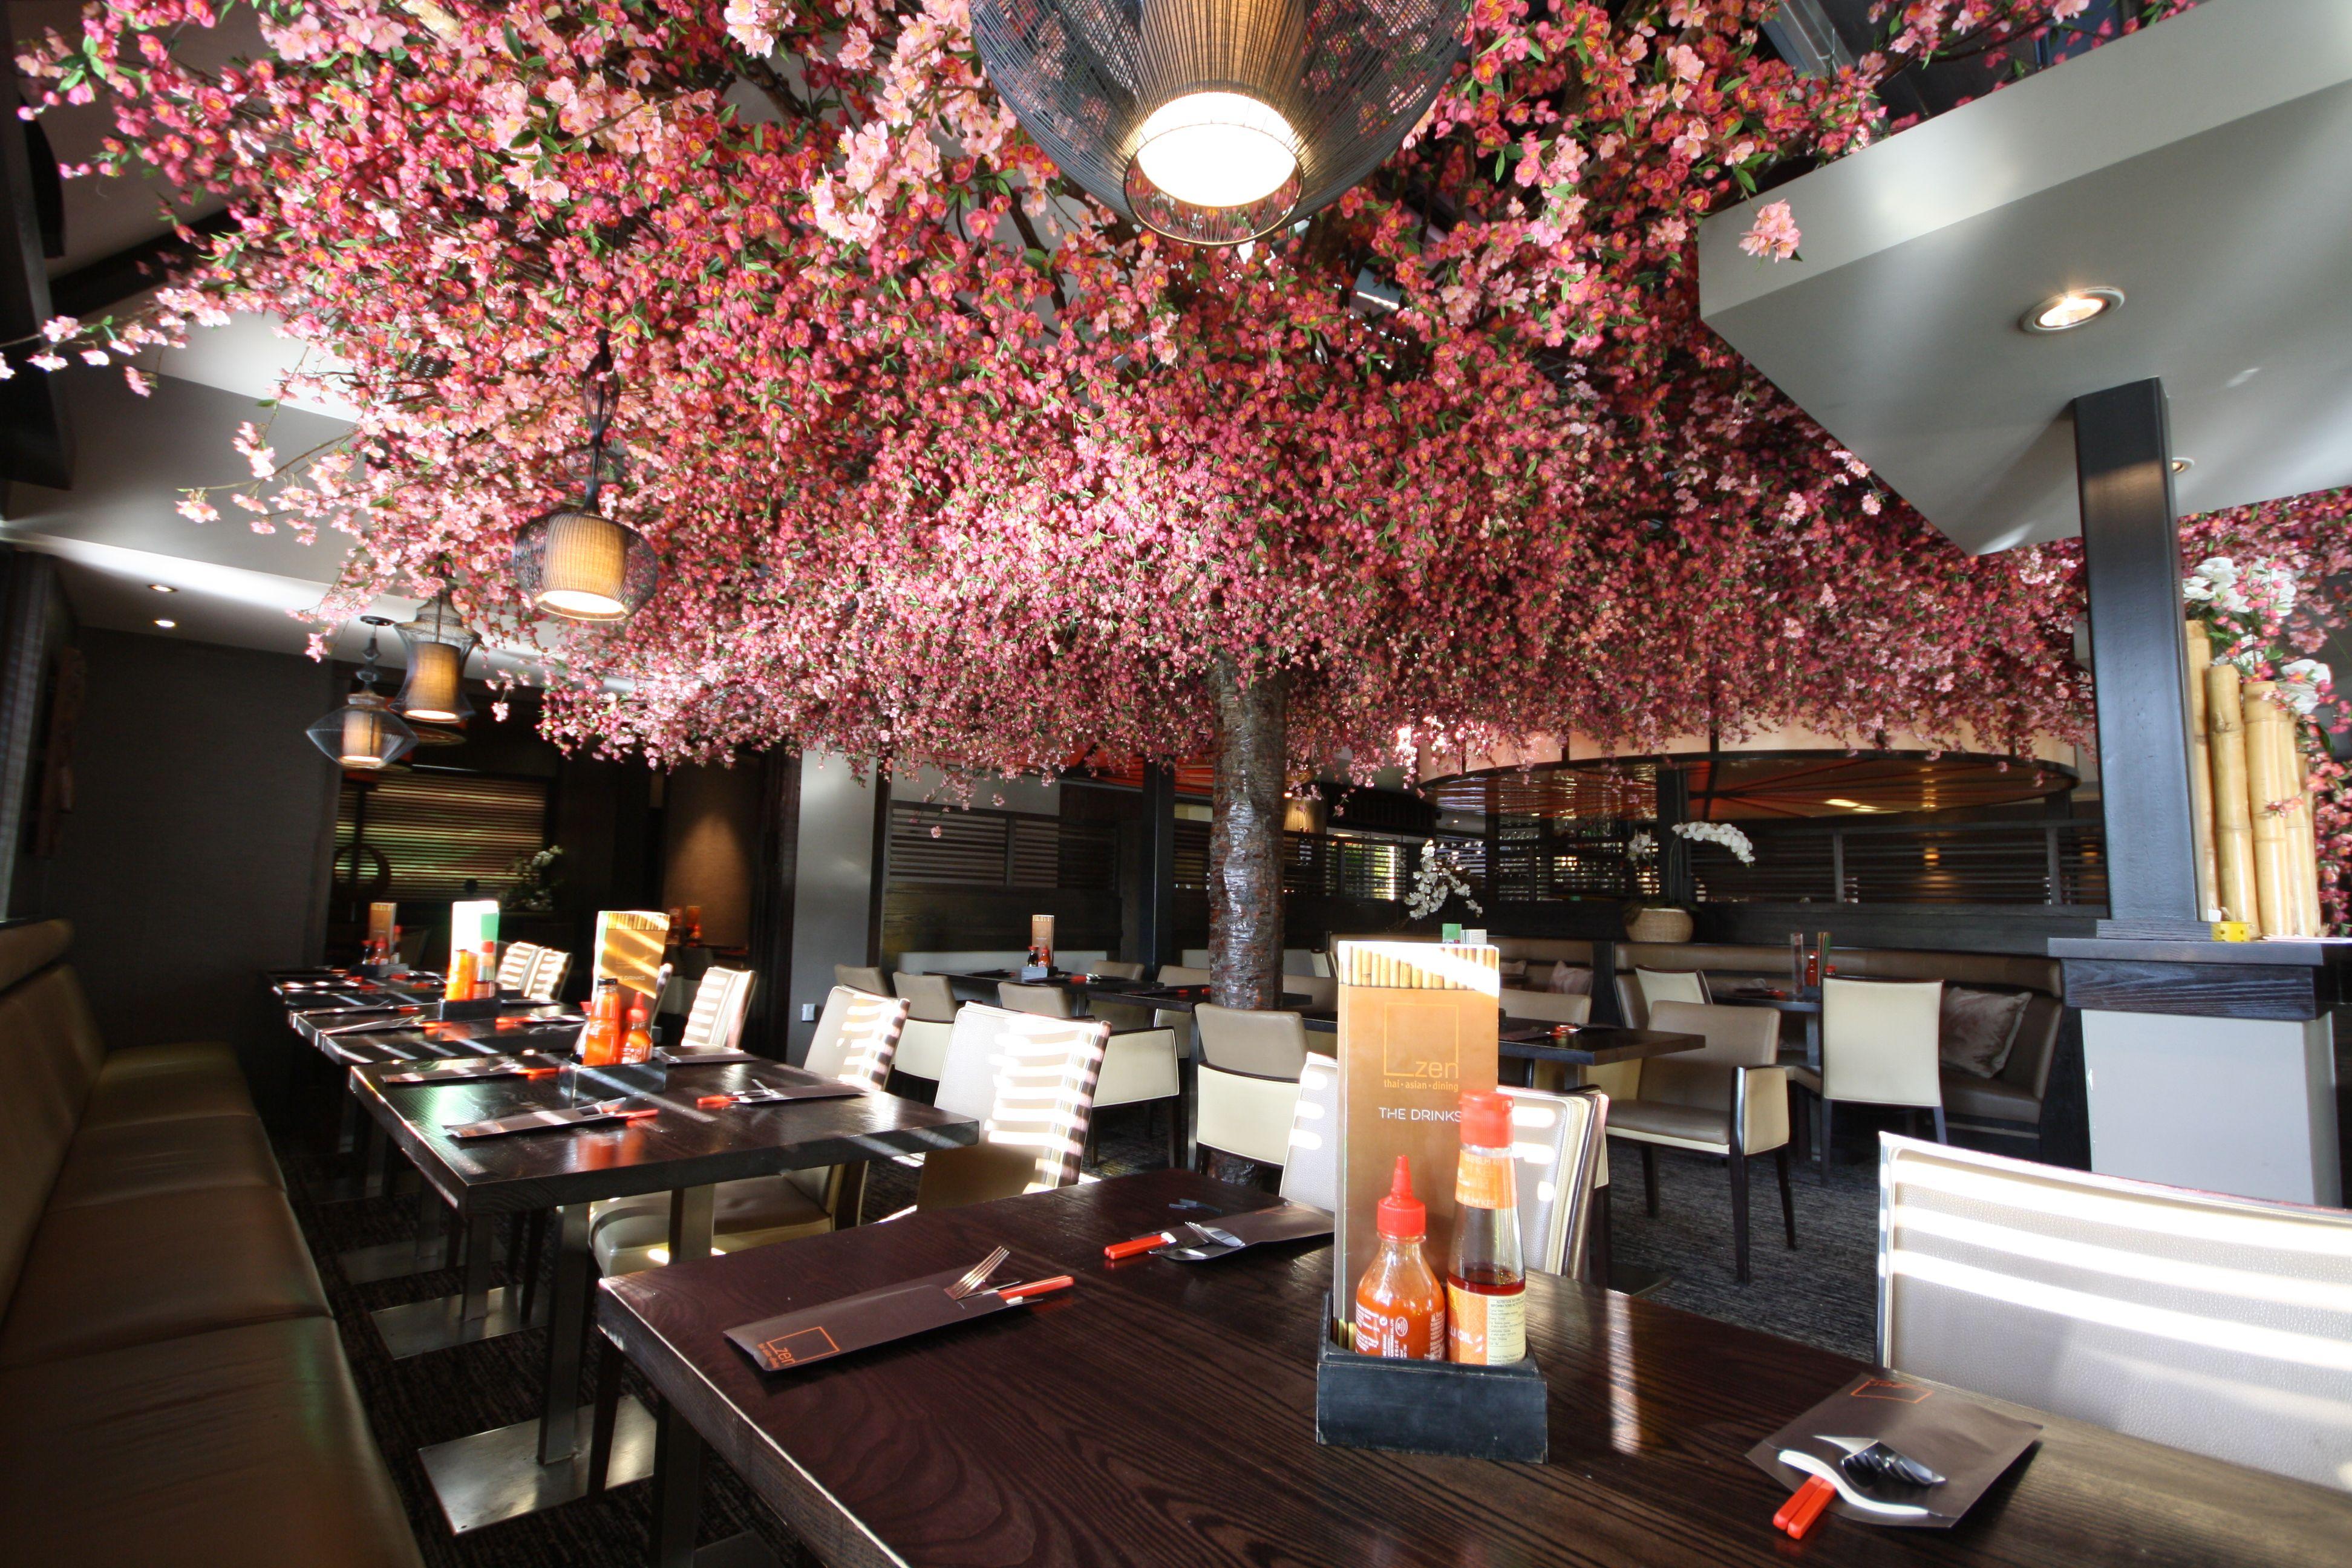 Pin By Kamilla Schultz On Basement Artificial Cherry Blossom Tree Blossom Trees Cherry Blossom Tree